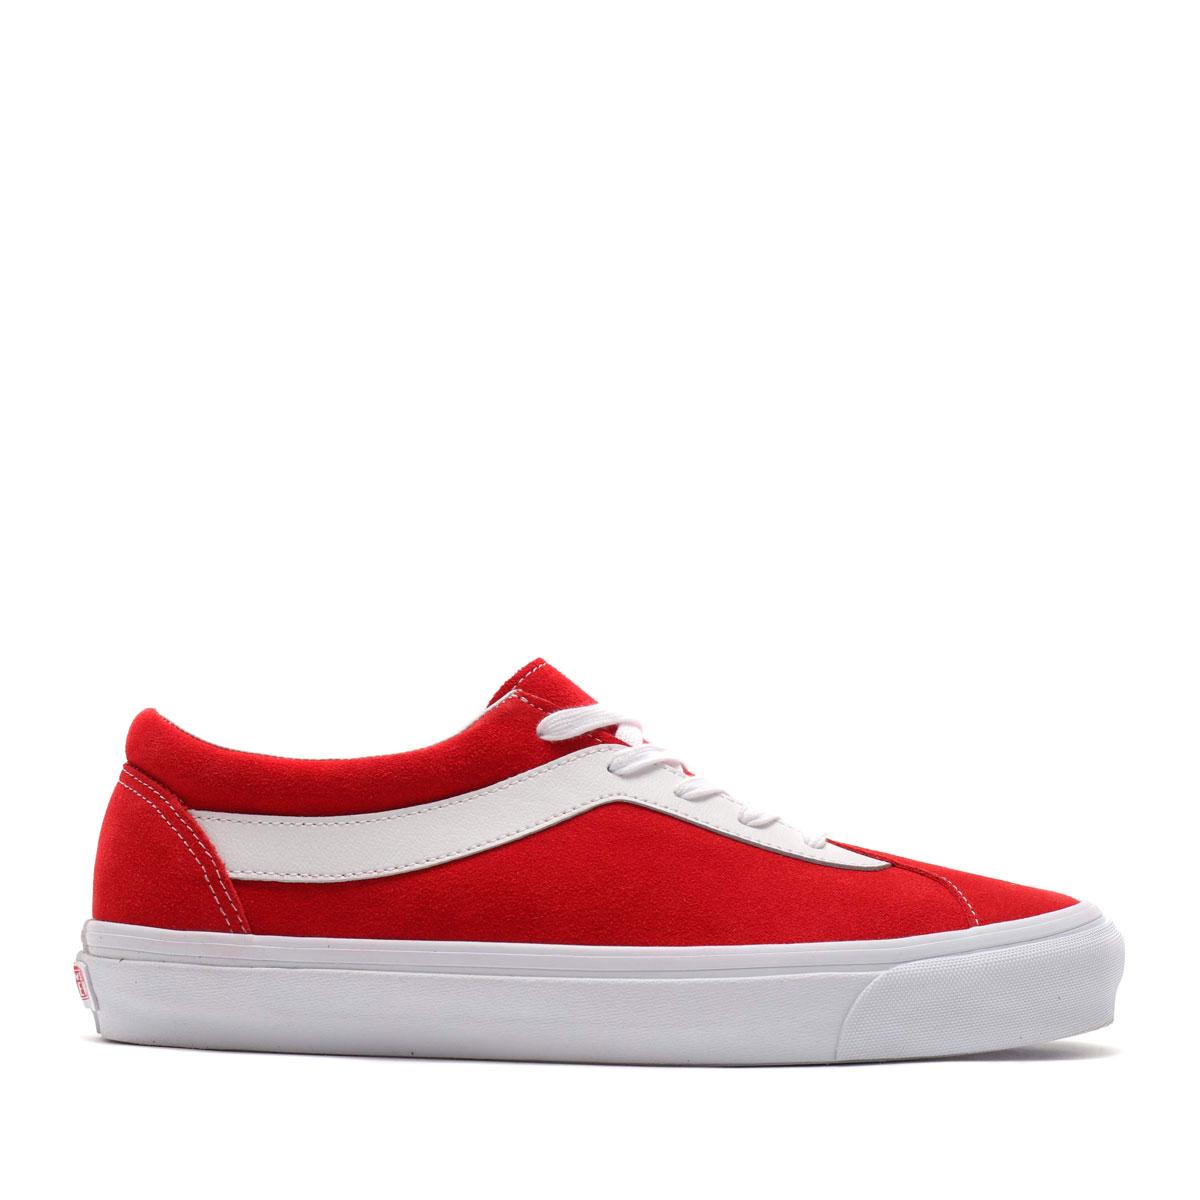 VANS BOLD NI STAPLE(RACING RED/TRUE WHITE)(ヴァンズ ボールド ニー)【メンズ】【スニーカー】【19SP-I】